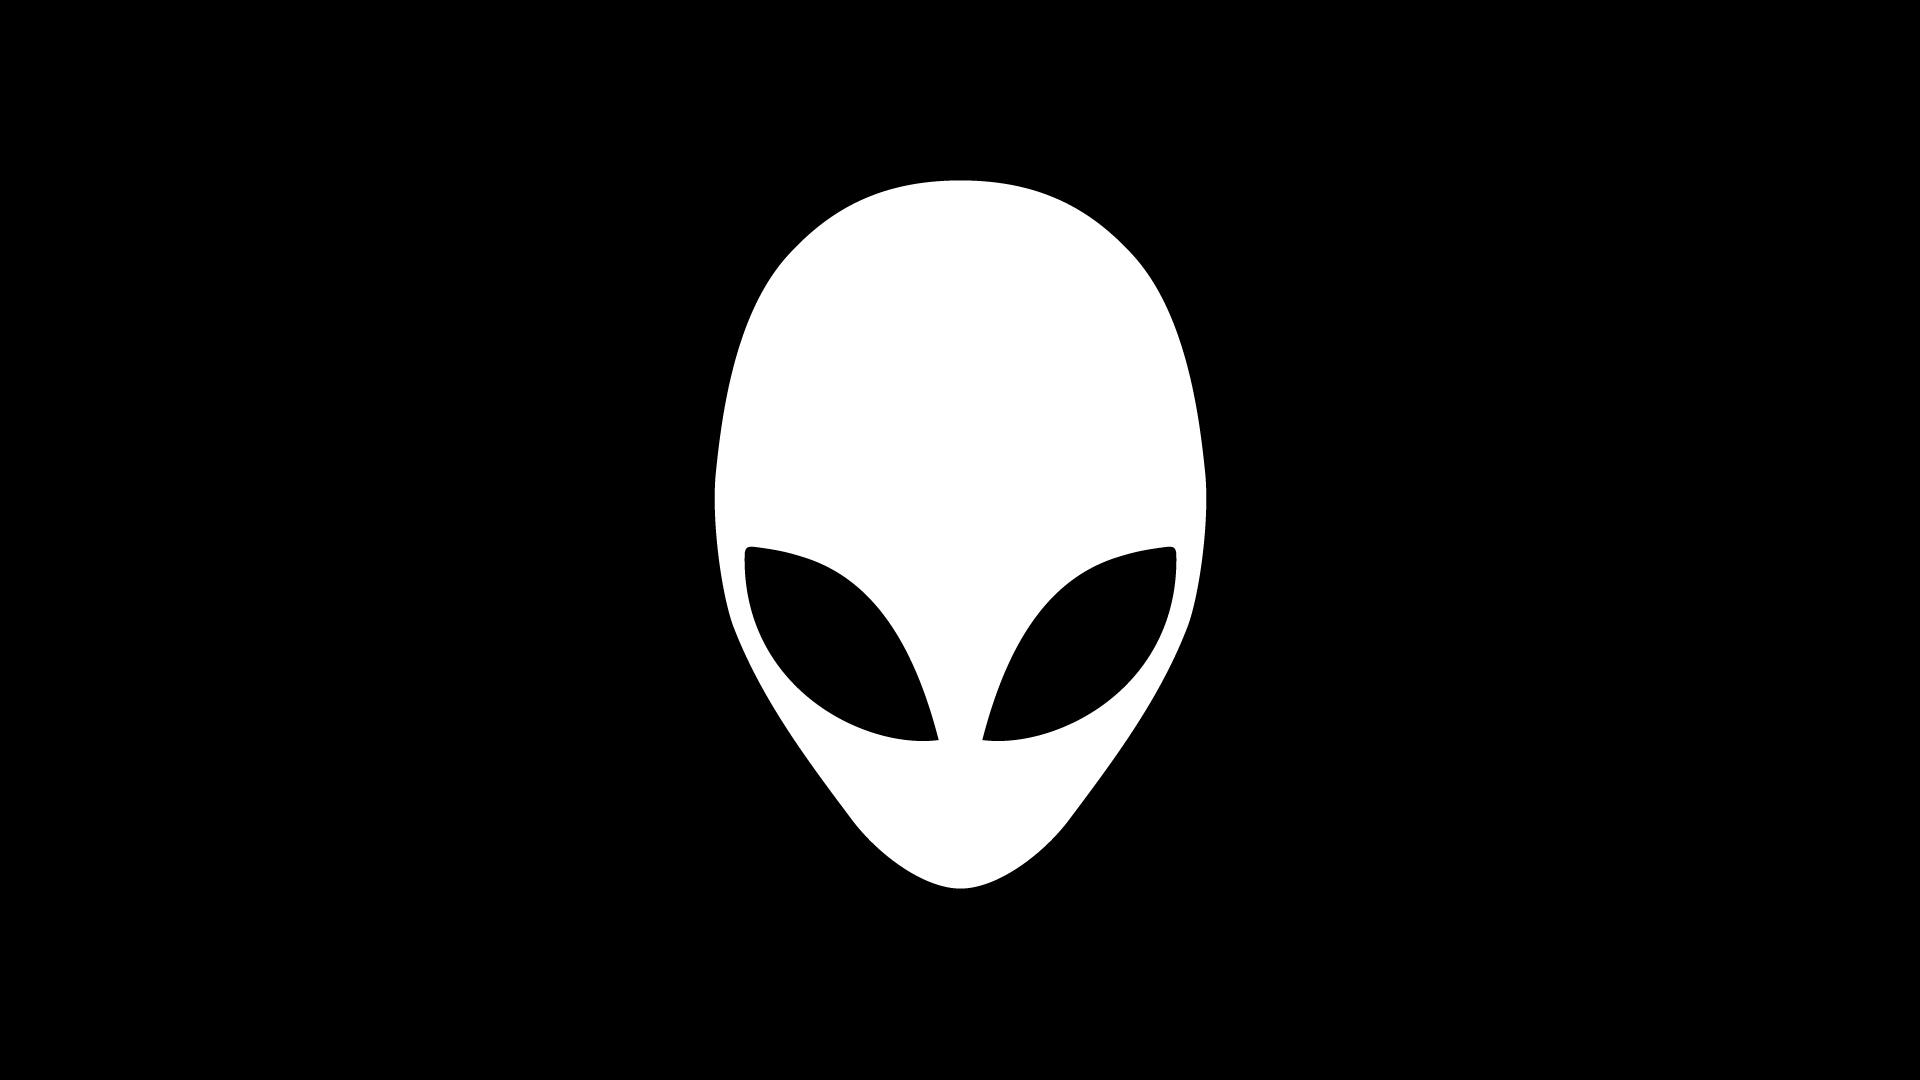 alienware simple logo black background hd 1920x1080 1080p wallpaper 1920x1080